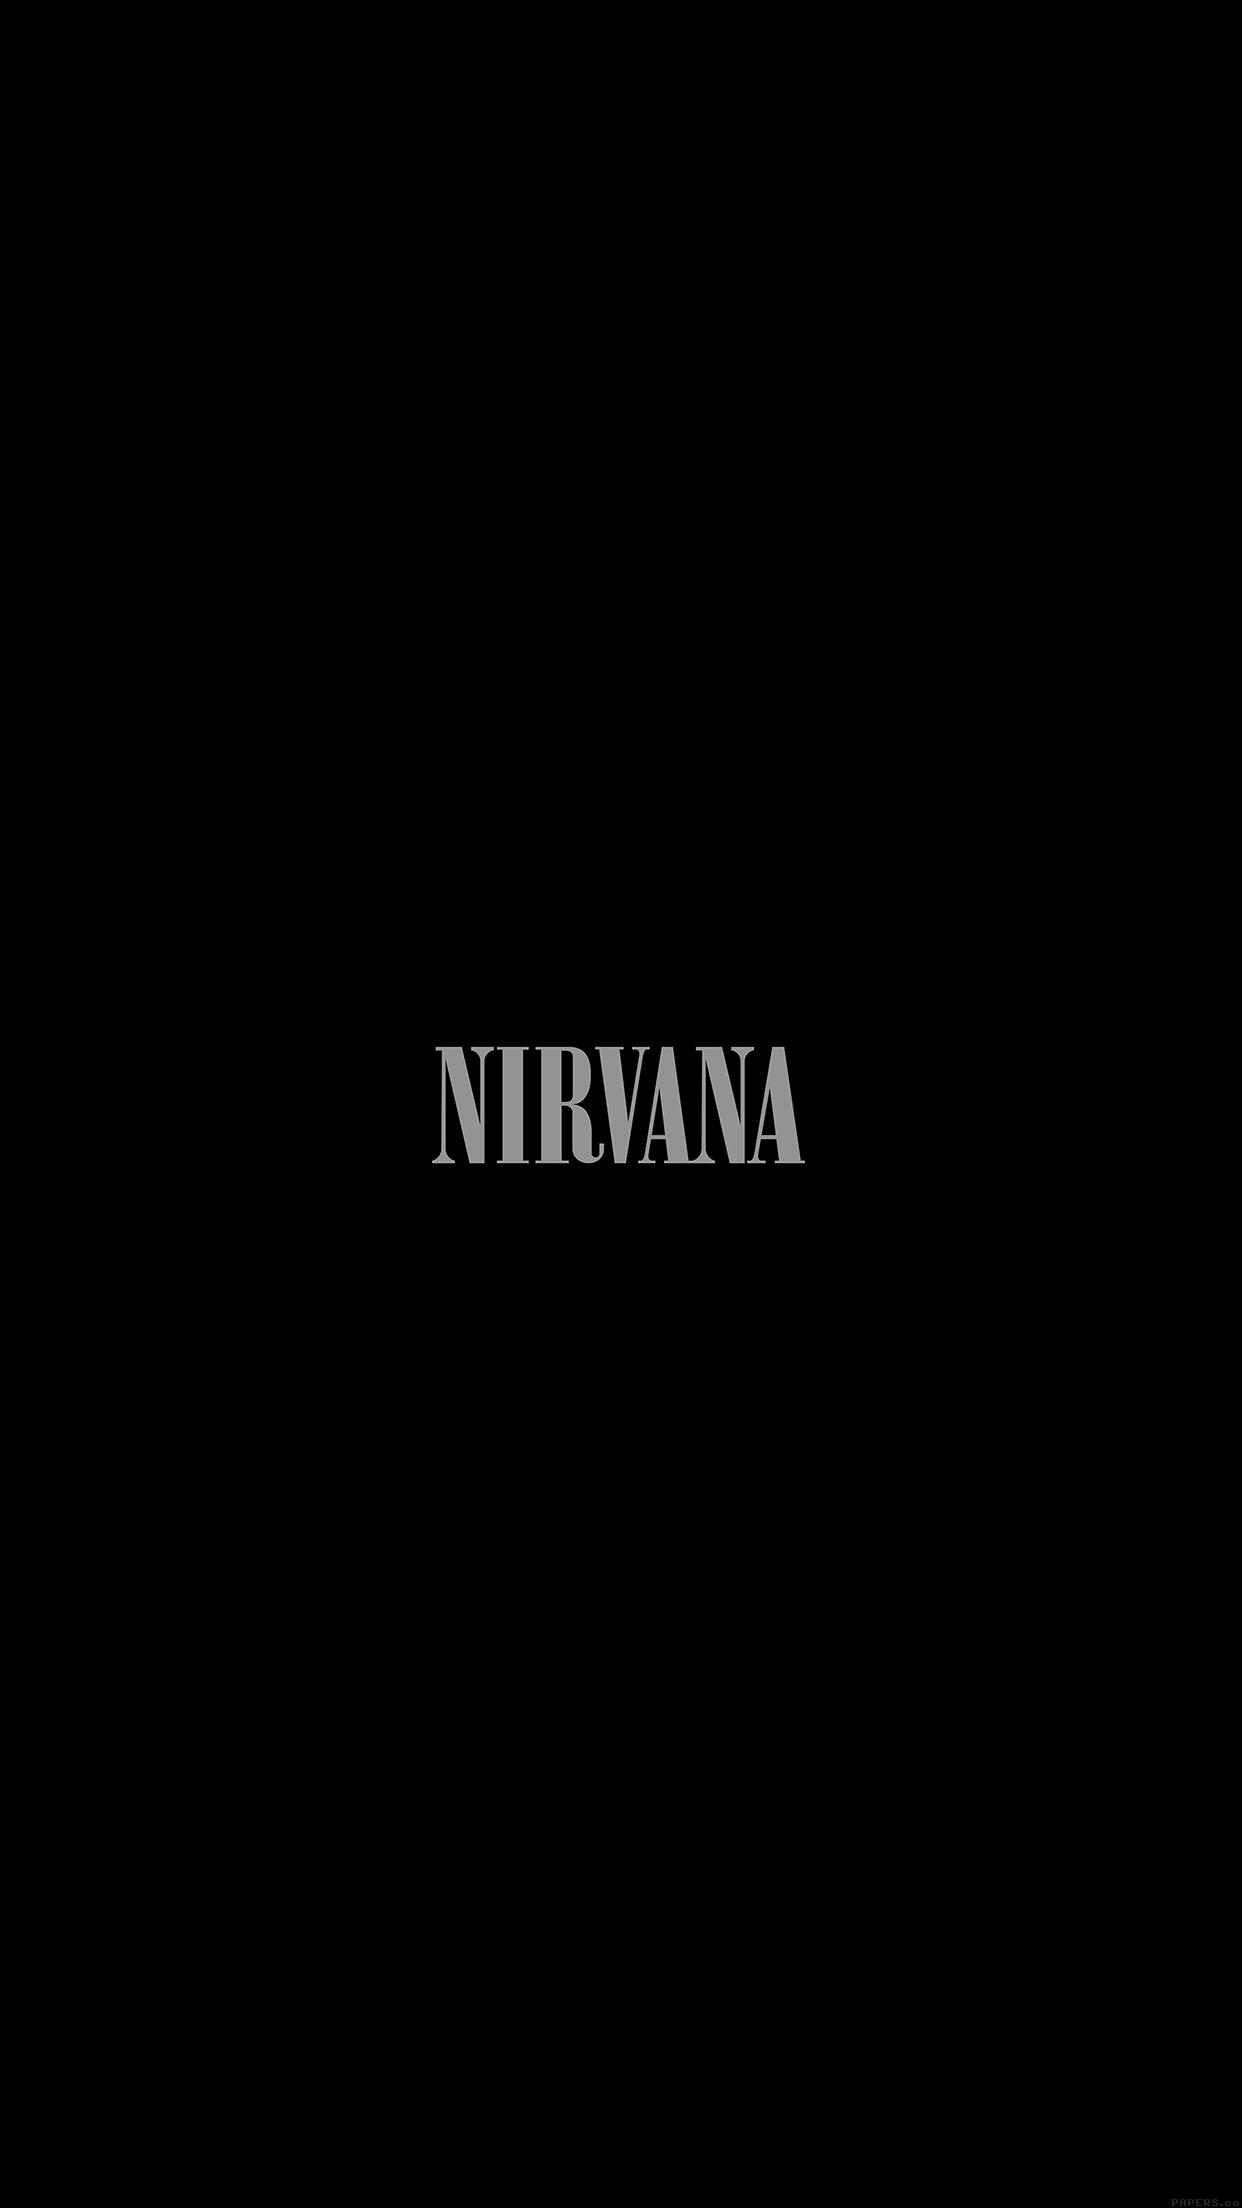 nirvana wallpaper iphone 6 plus